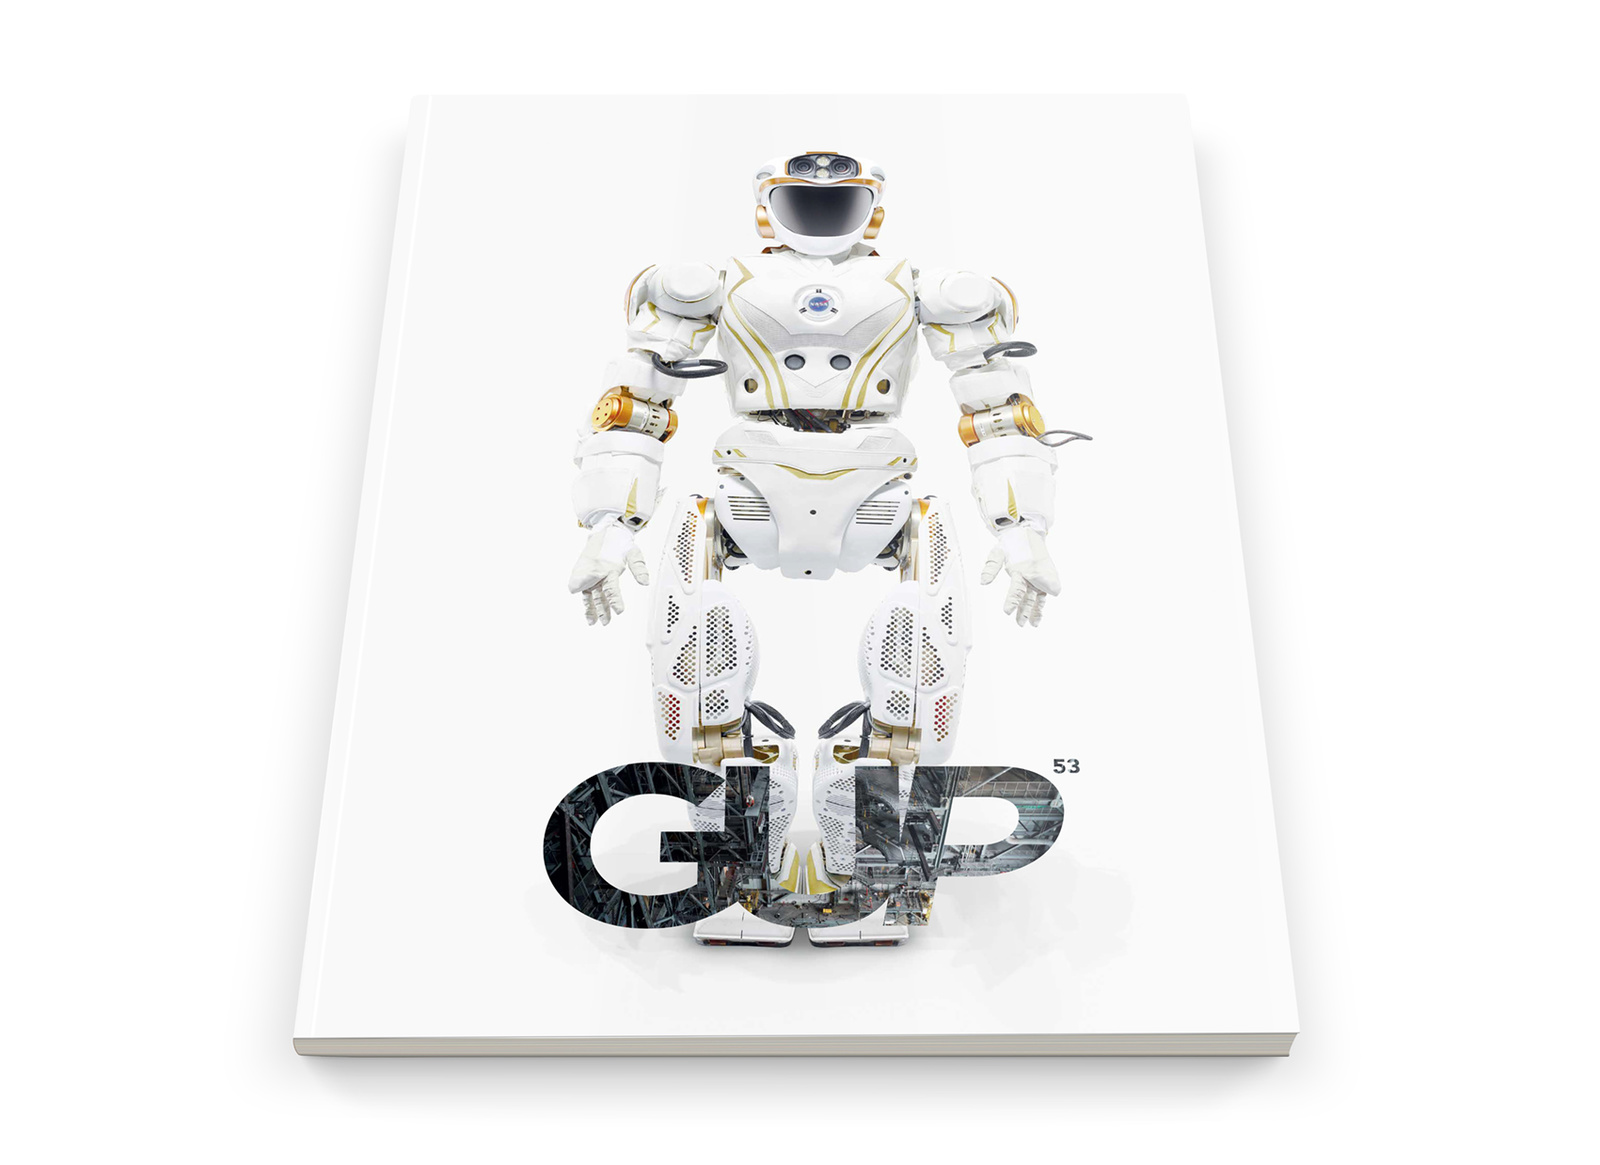 #53 — Infinity — GUP